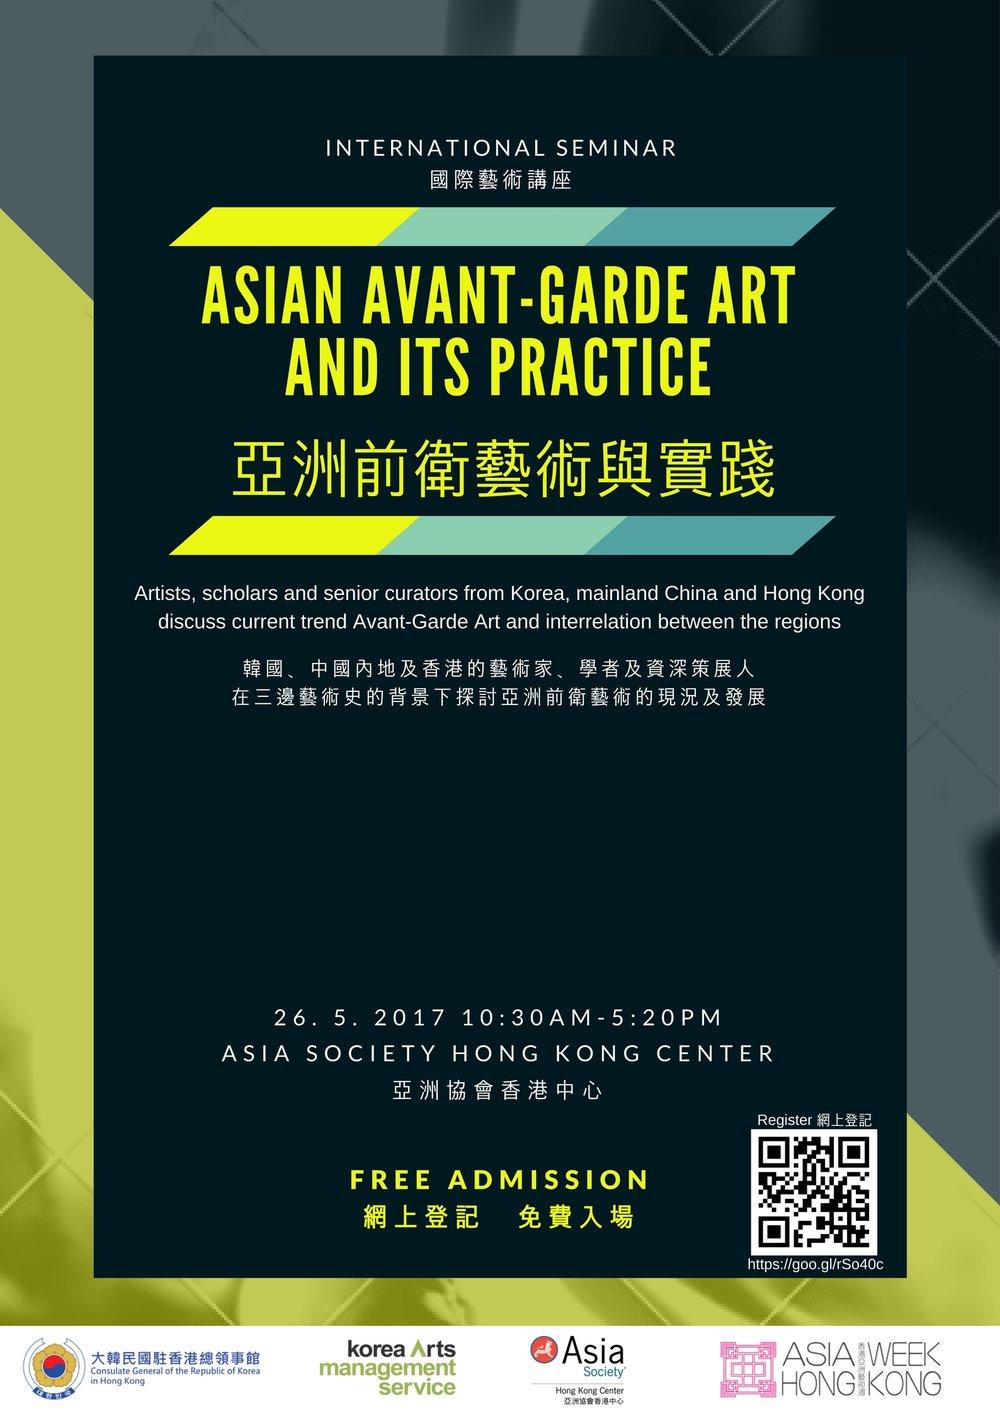 KAMS_International Seminar_052617